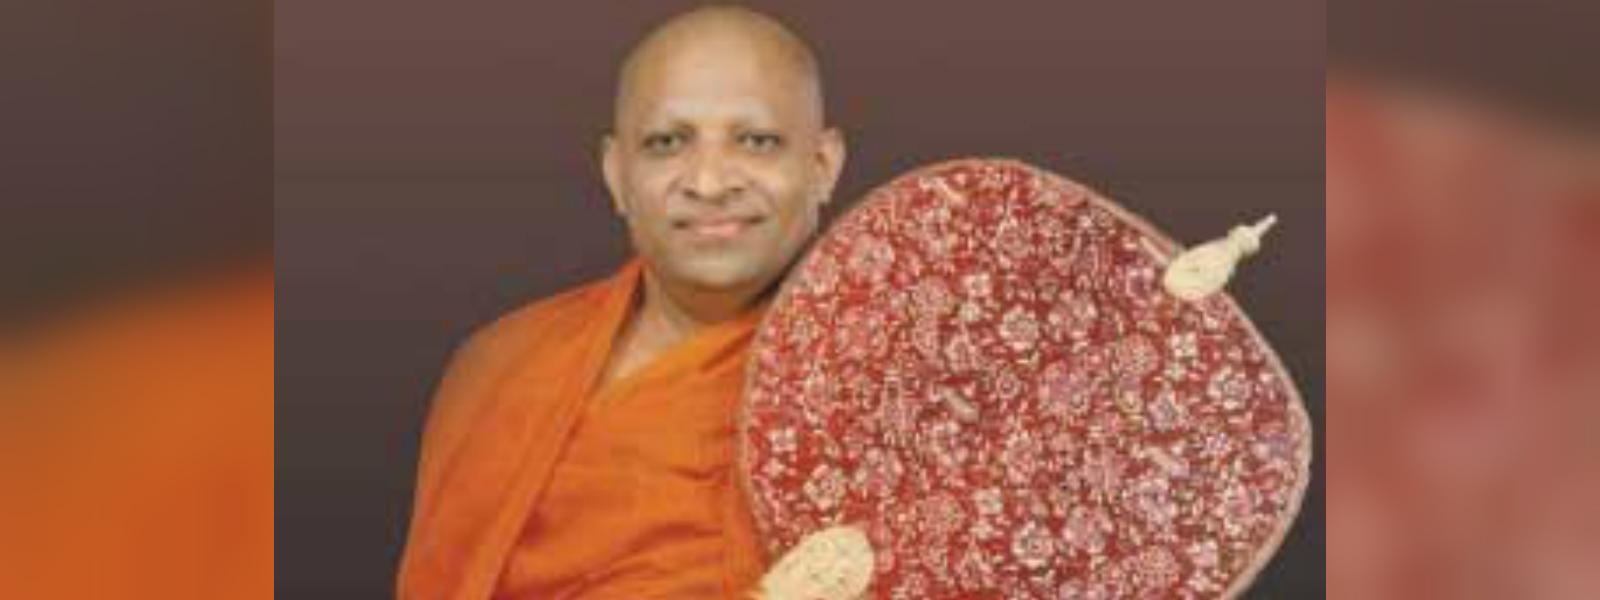 Malwatte Mahanayake celebrates 75th birthday